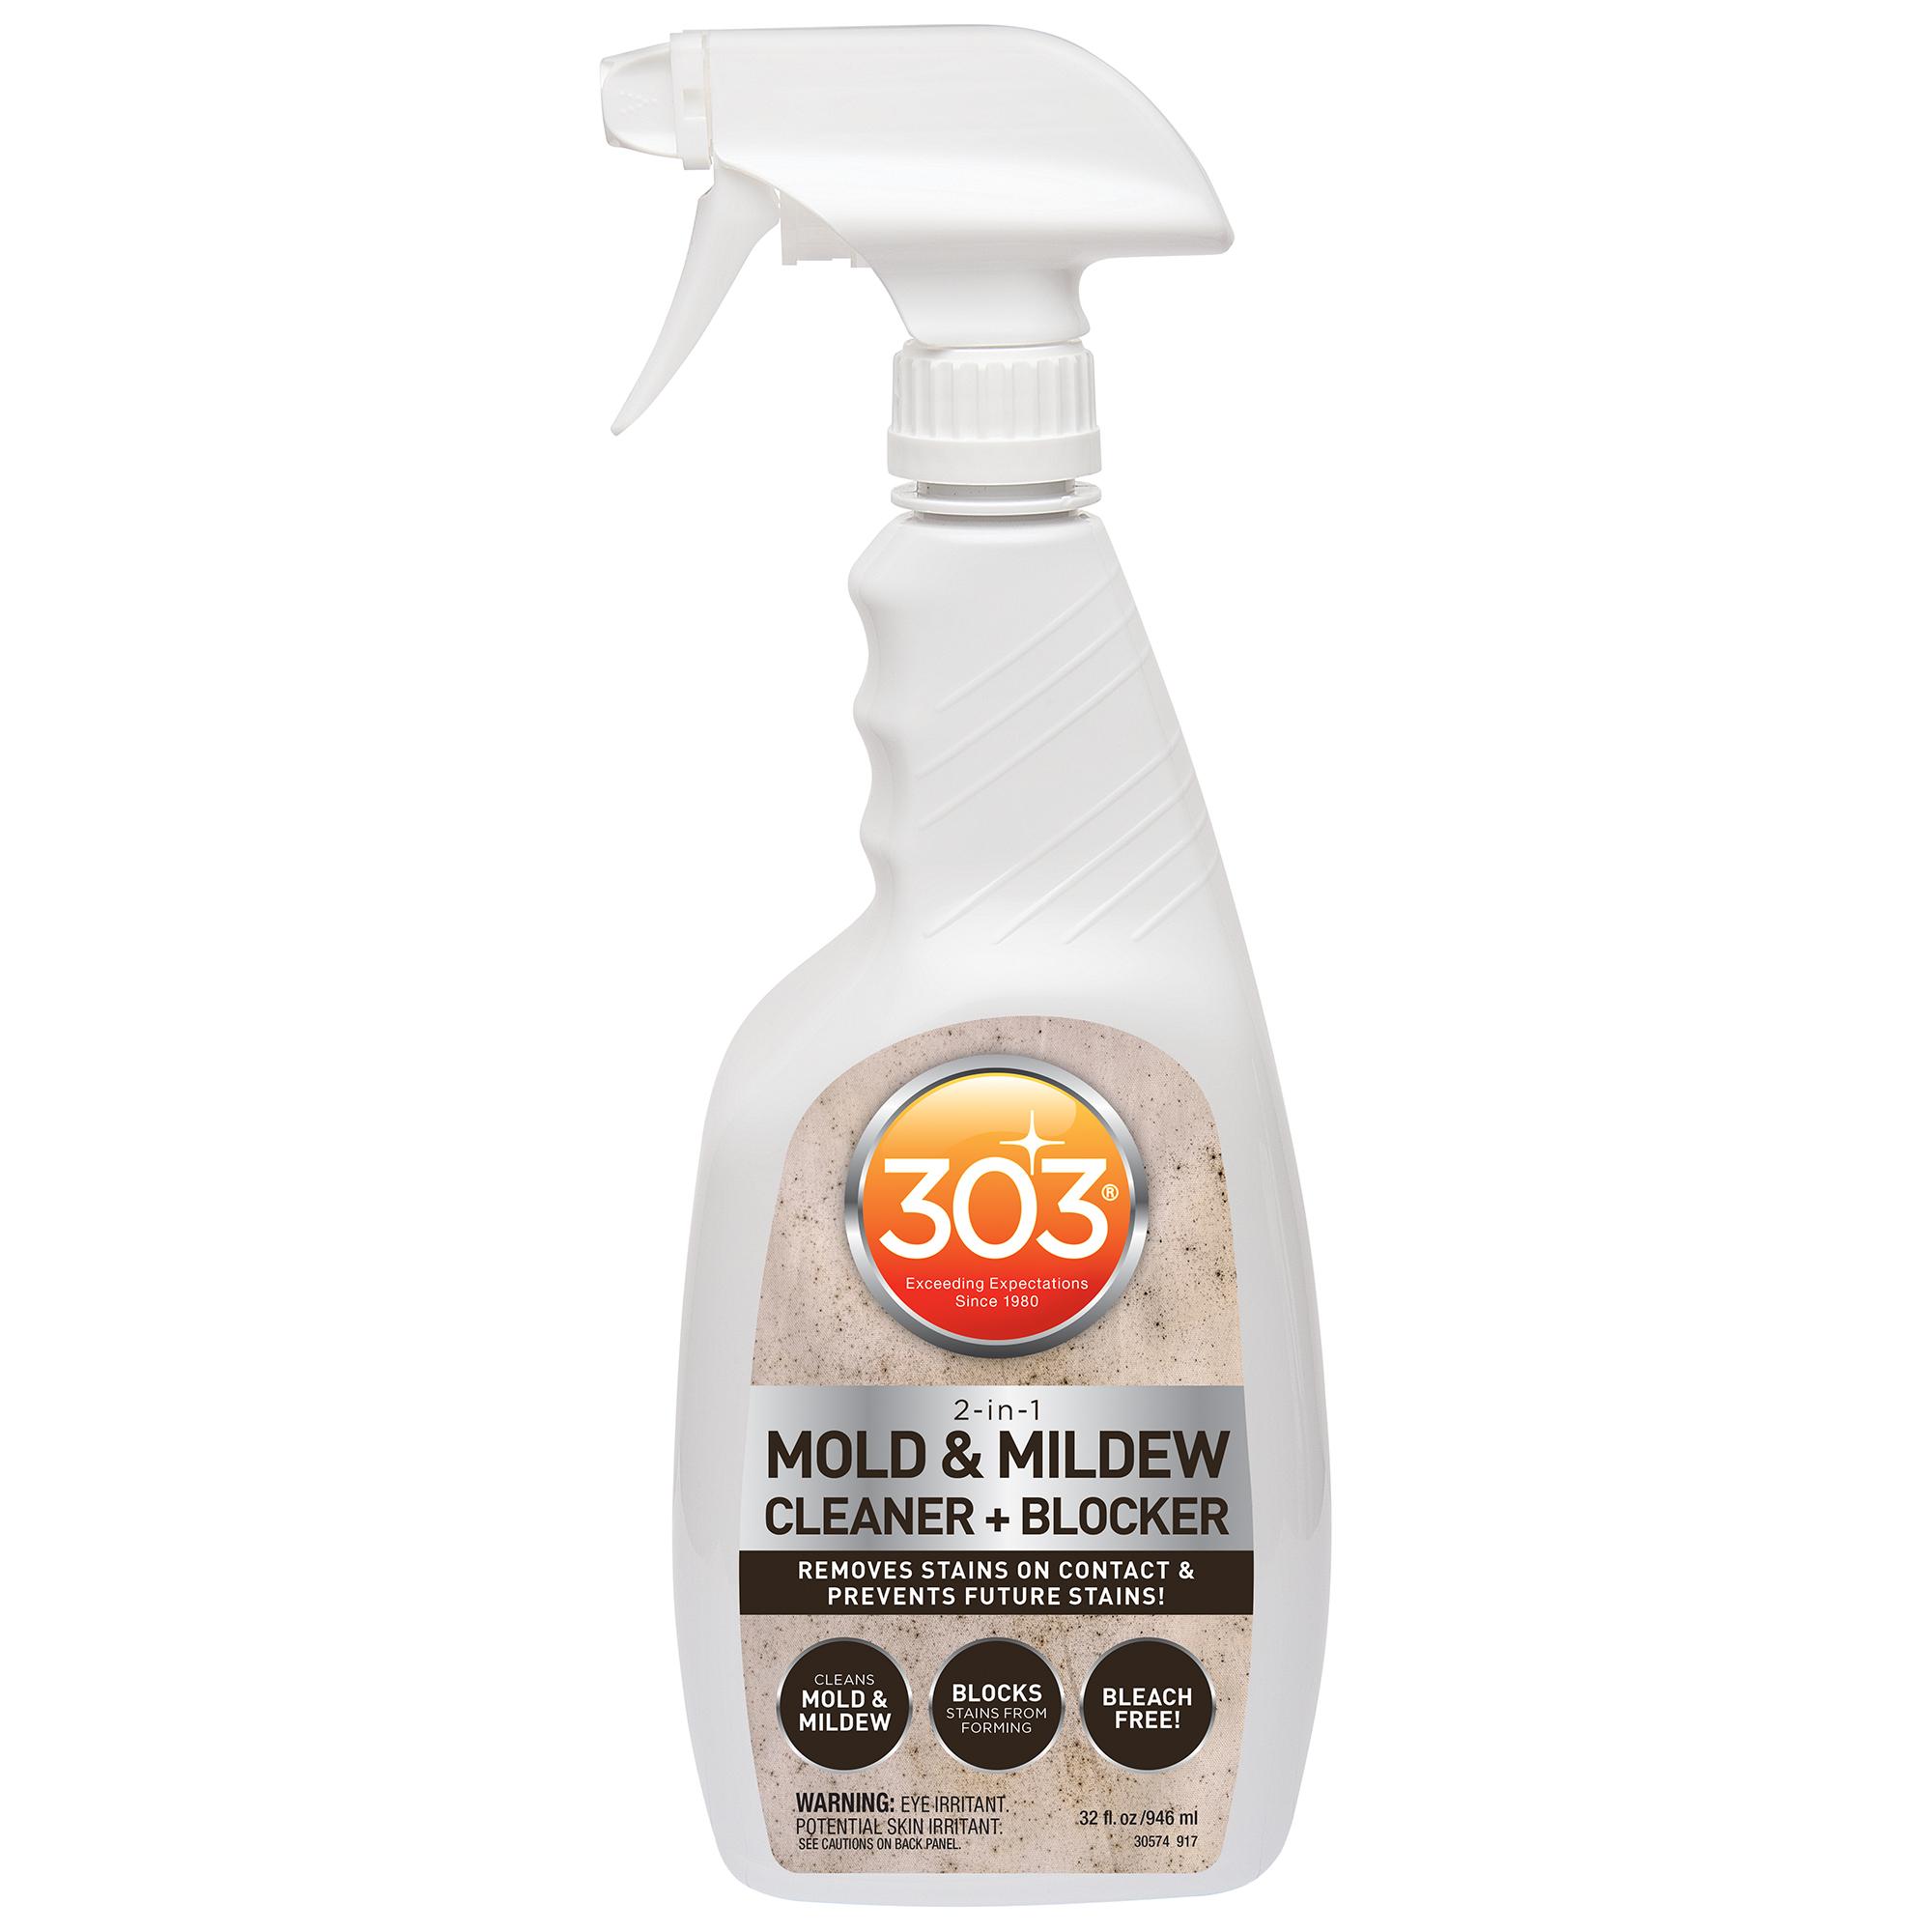 303 Mold And Mildew Cleaner + Blocker 32 oz.